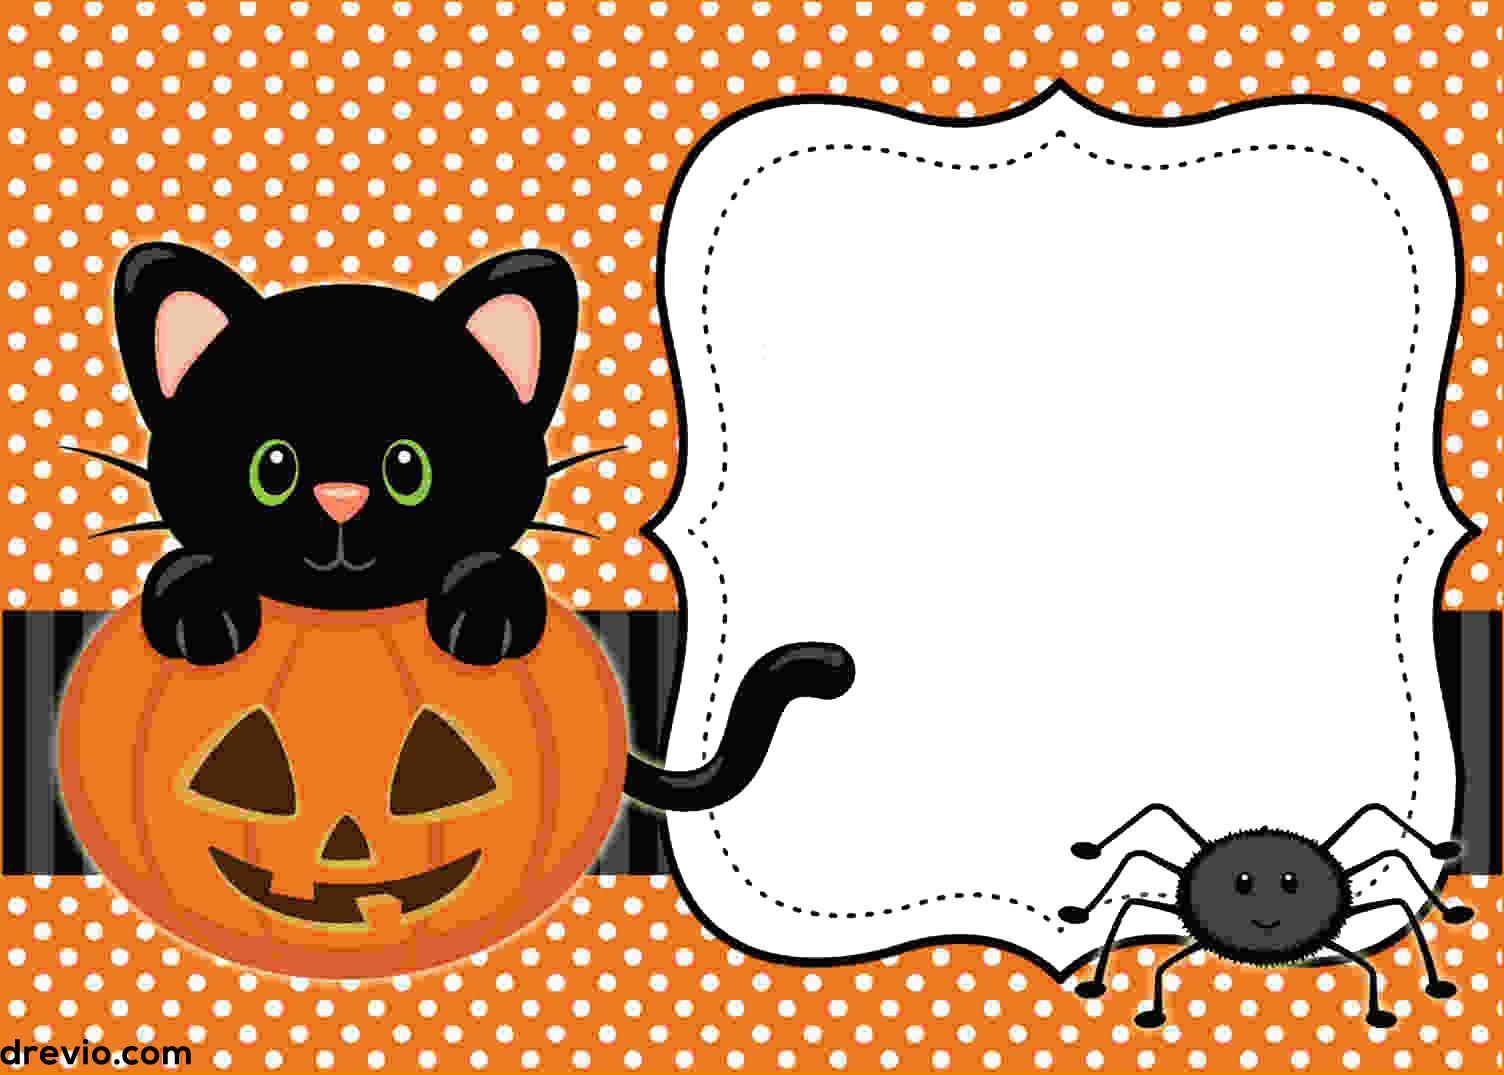 004 Singular Halloween Party Invitation Template Highest Quality  Microsoft Block OctoberFull